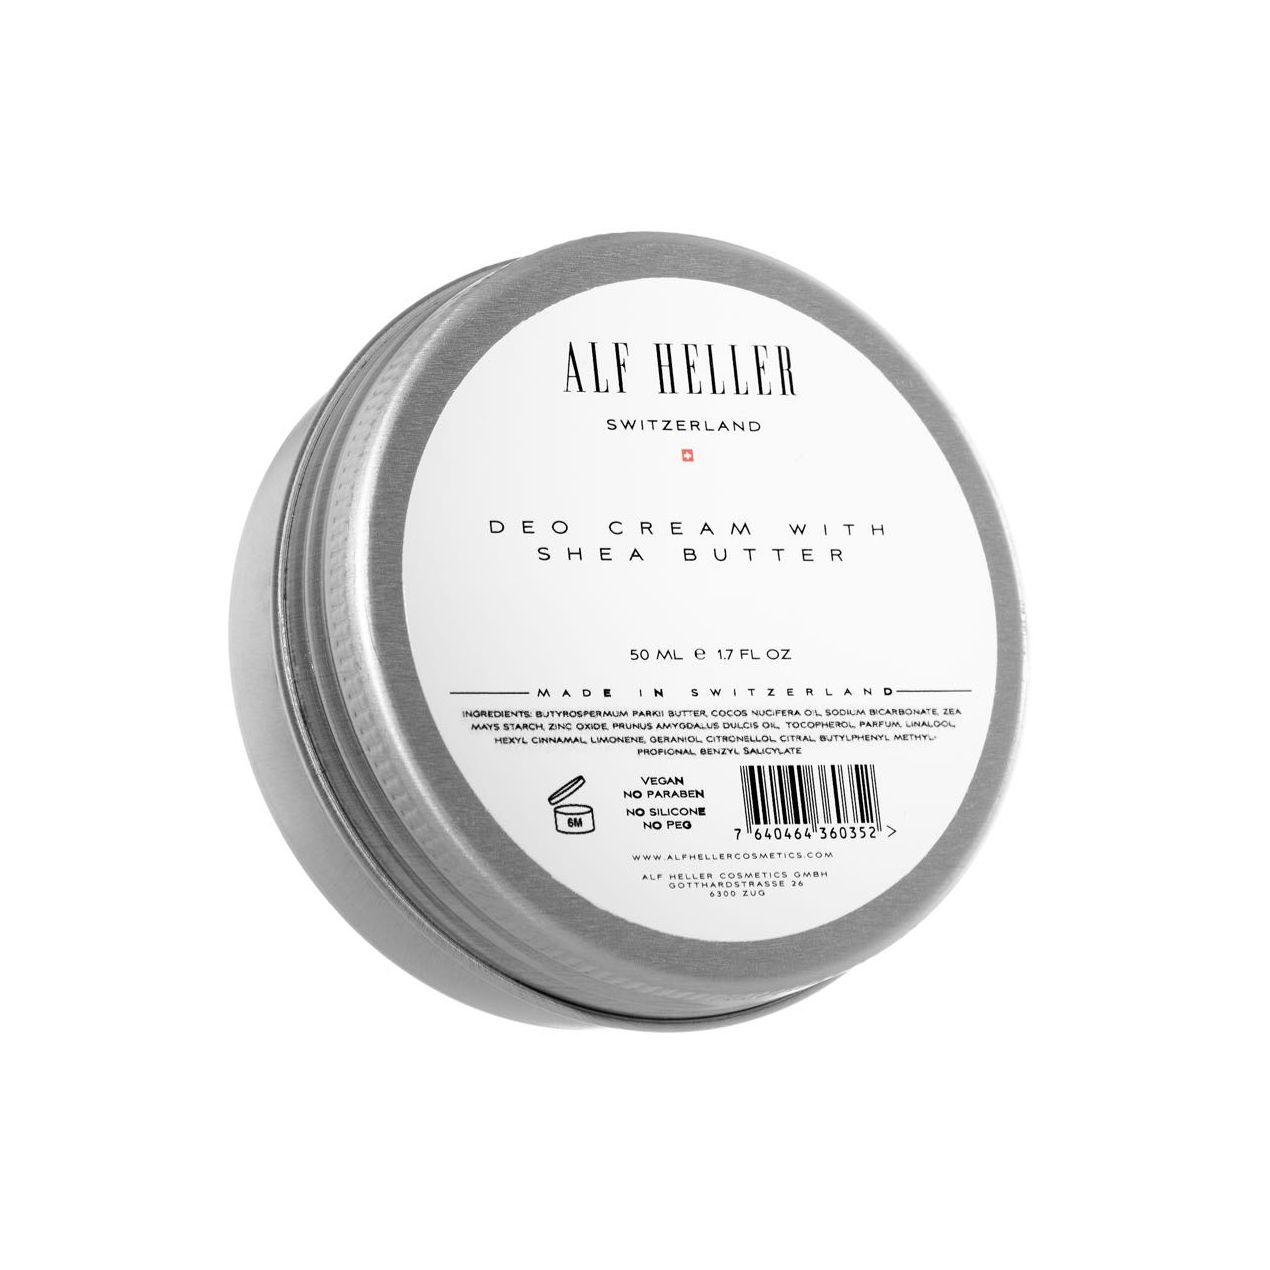 Alf Heller Switzerland-DEO CREAM with shea butter